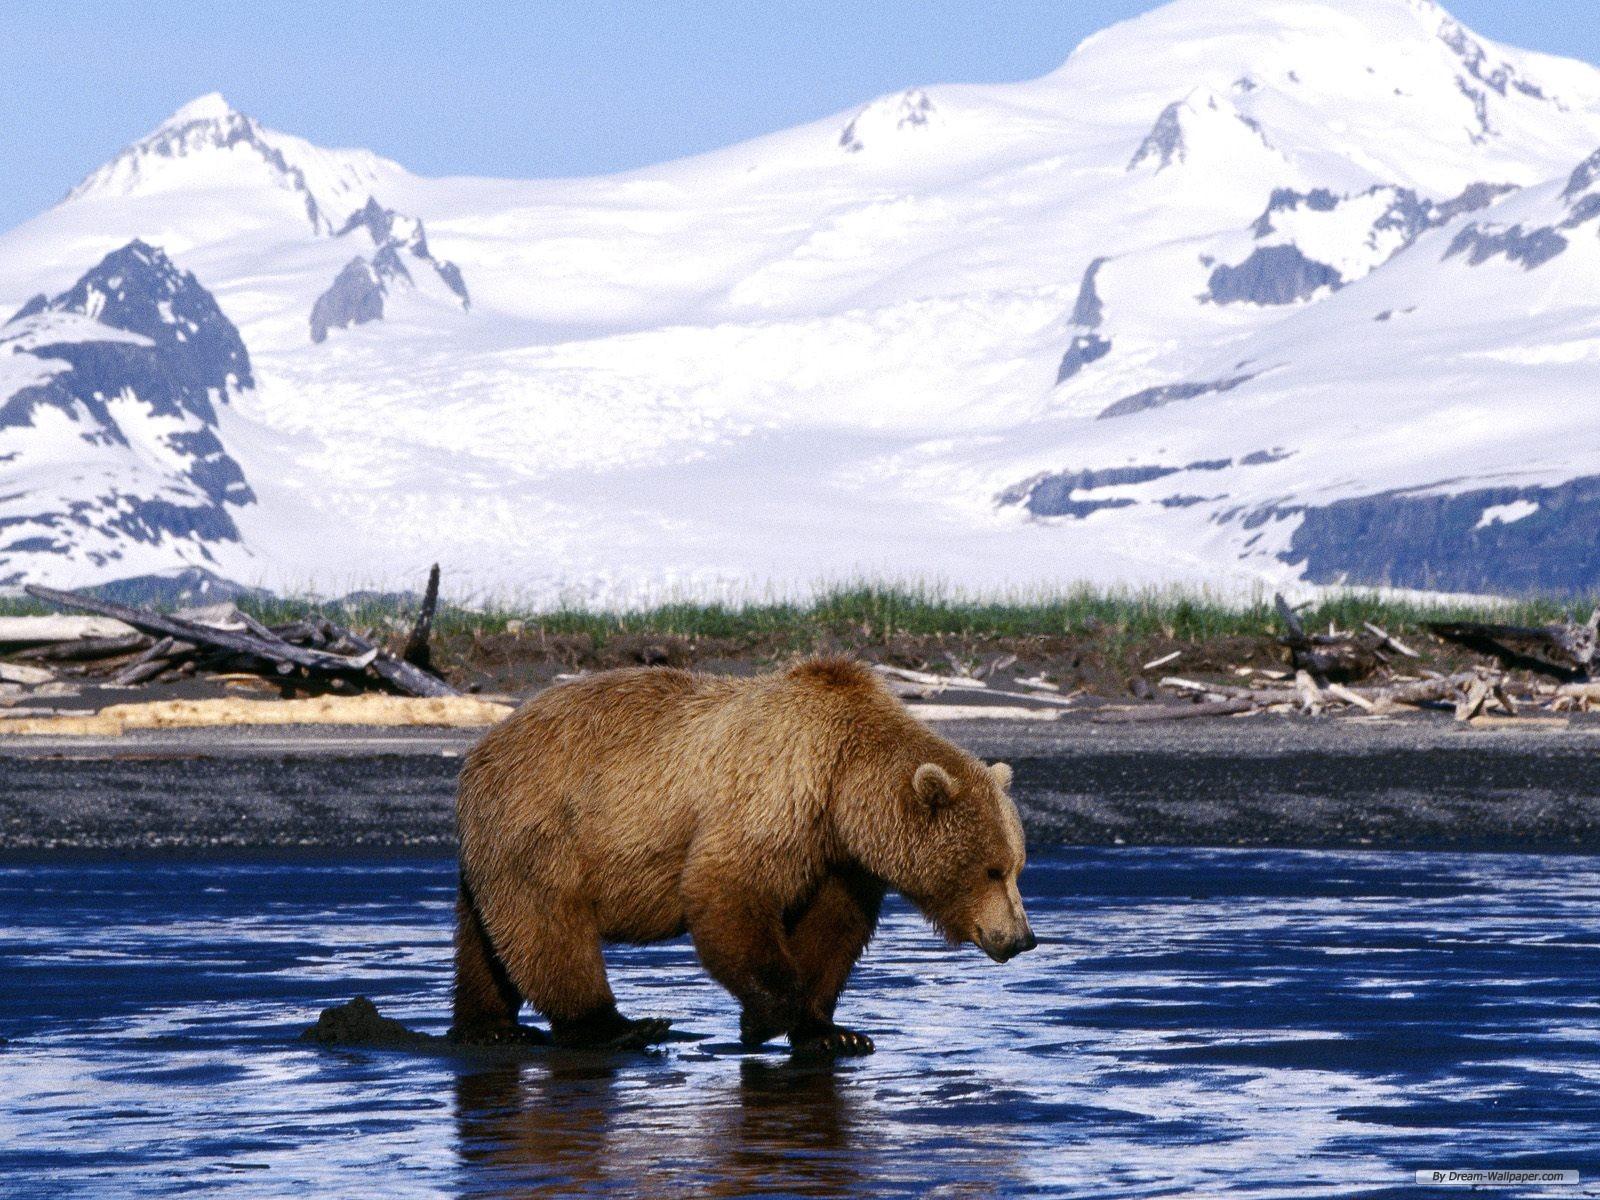 Wallpaper - Free Nature wallpaper - Webshots Daily Photo wallpaper ...